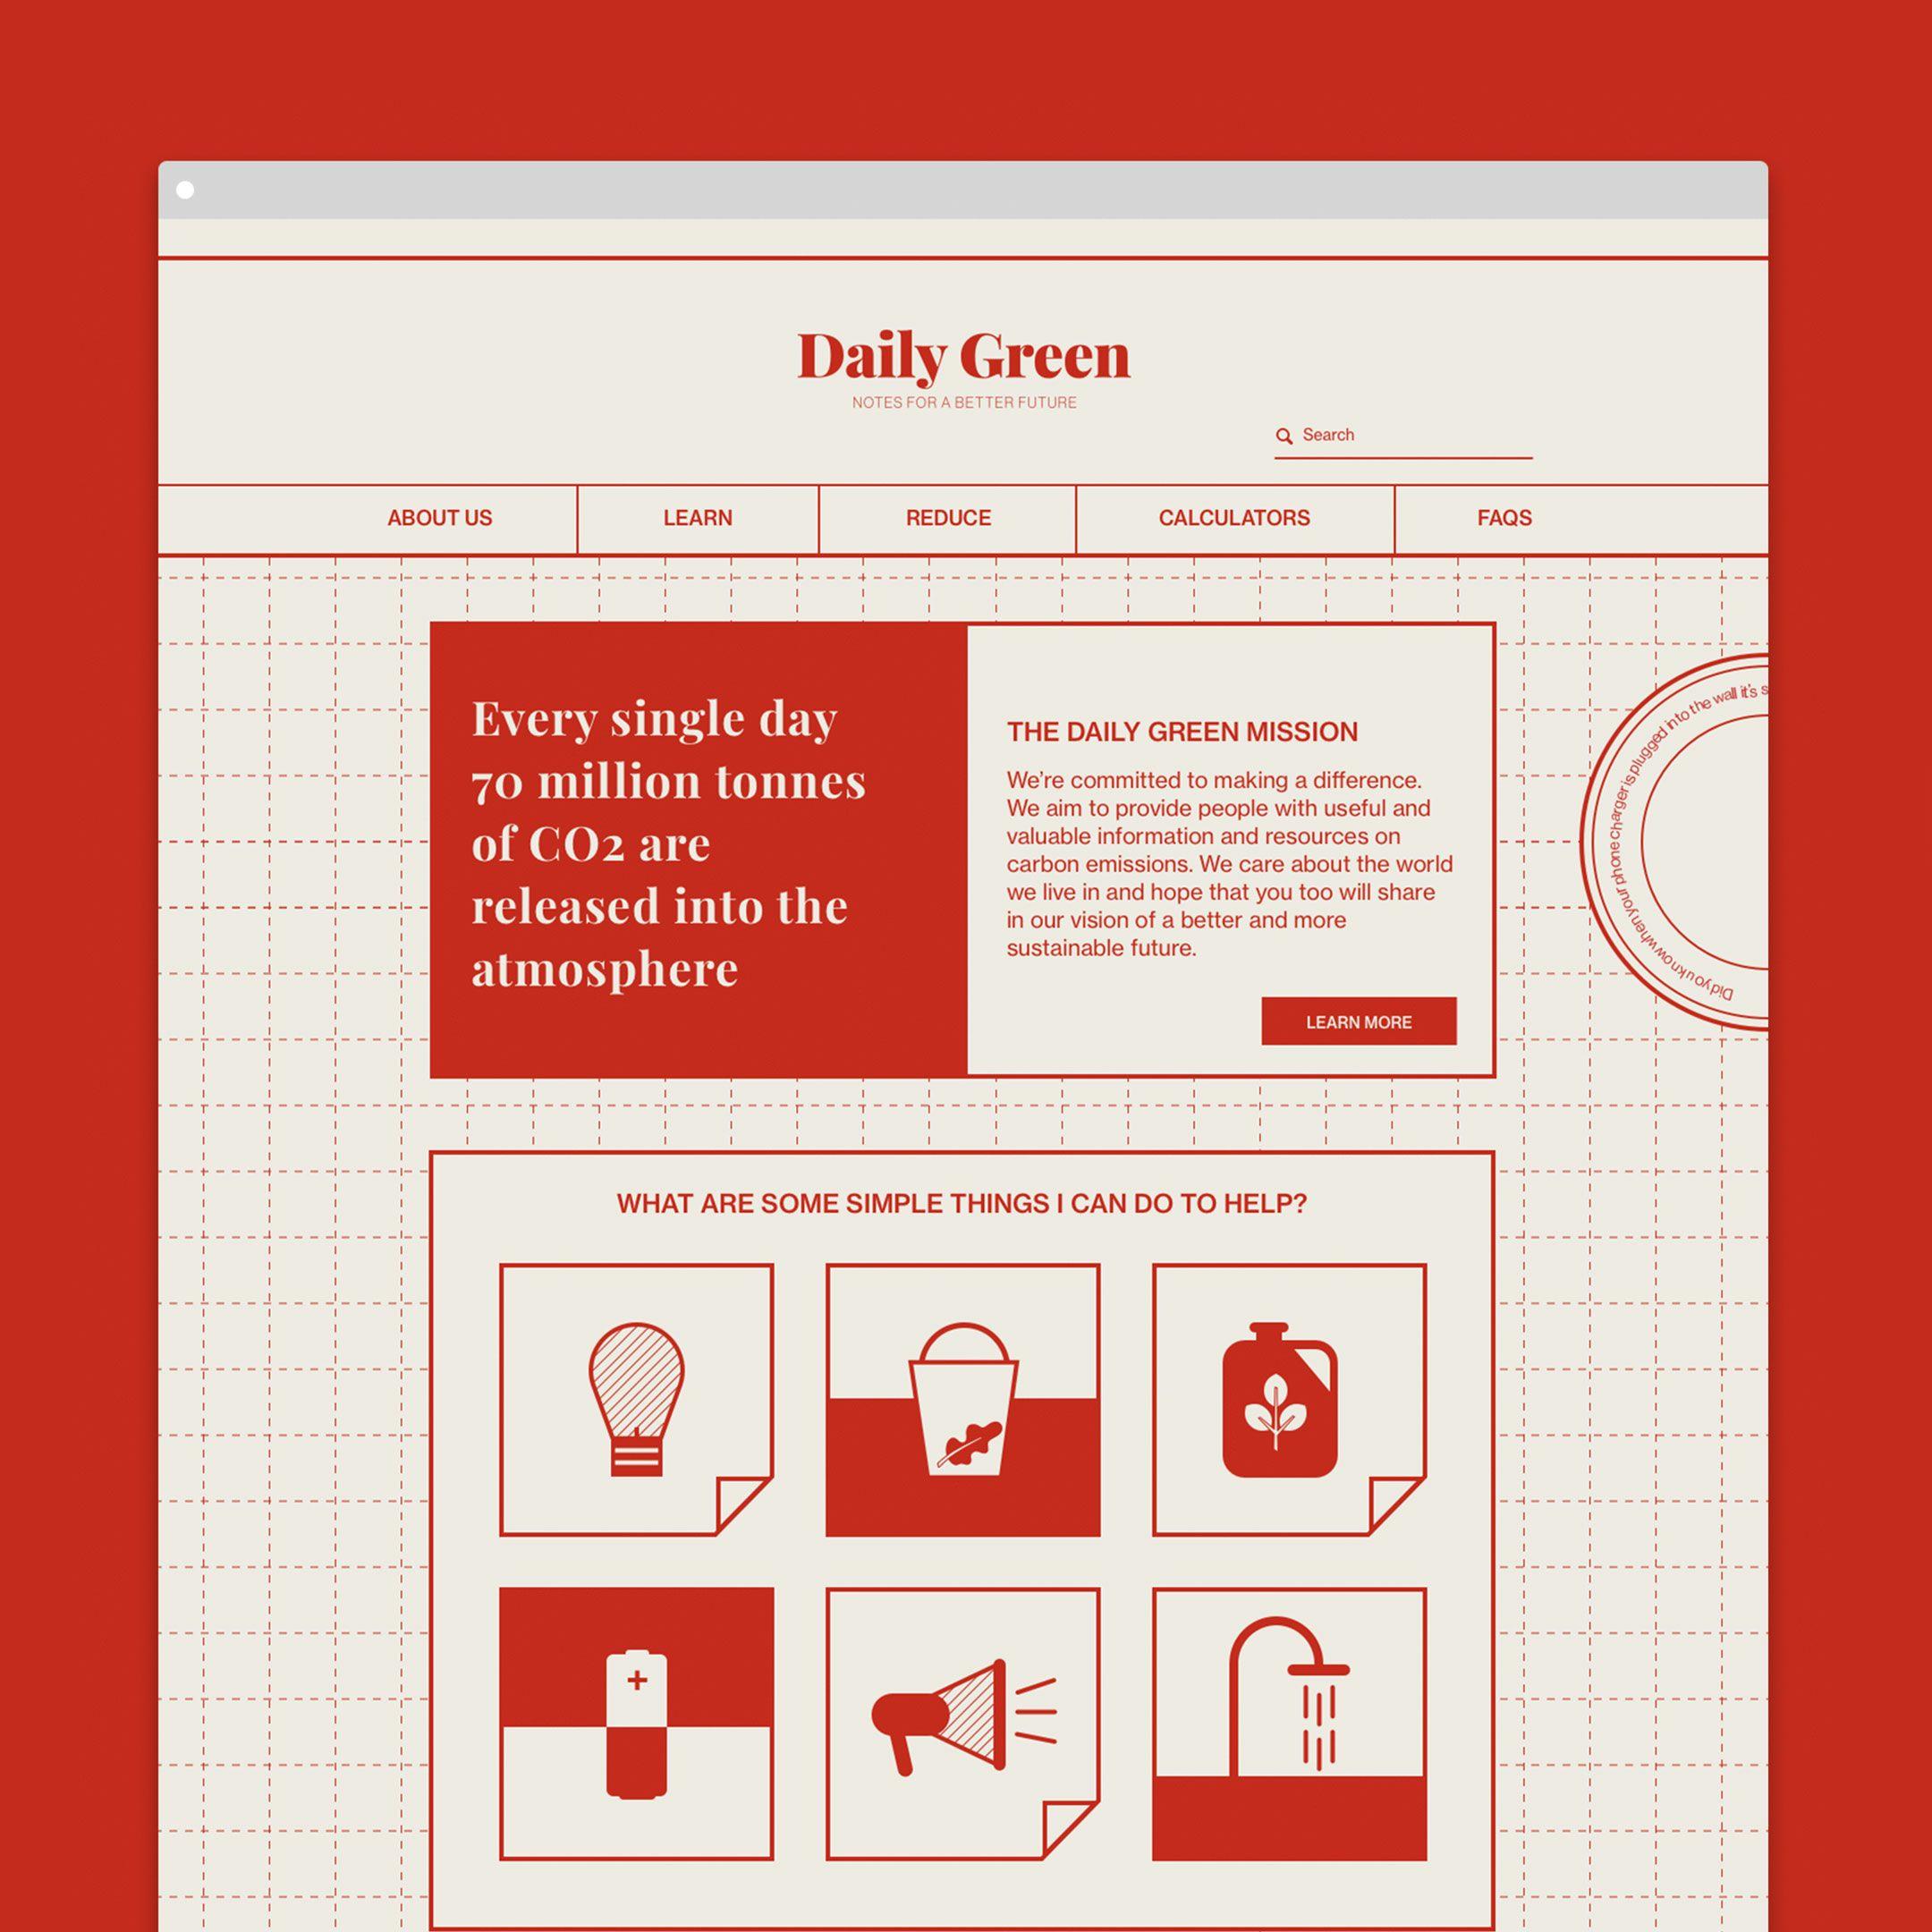 School Bookcover Design: Digital By Jessica Ibbett, Shillington Graduate